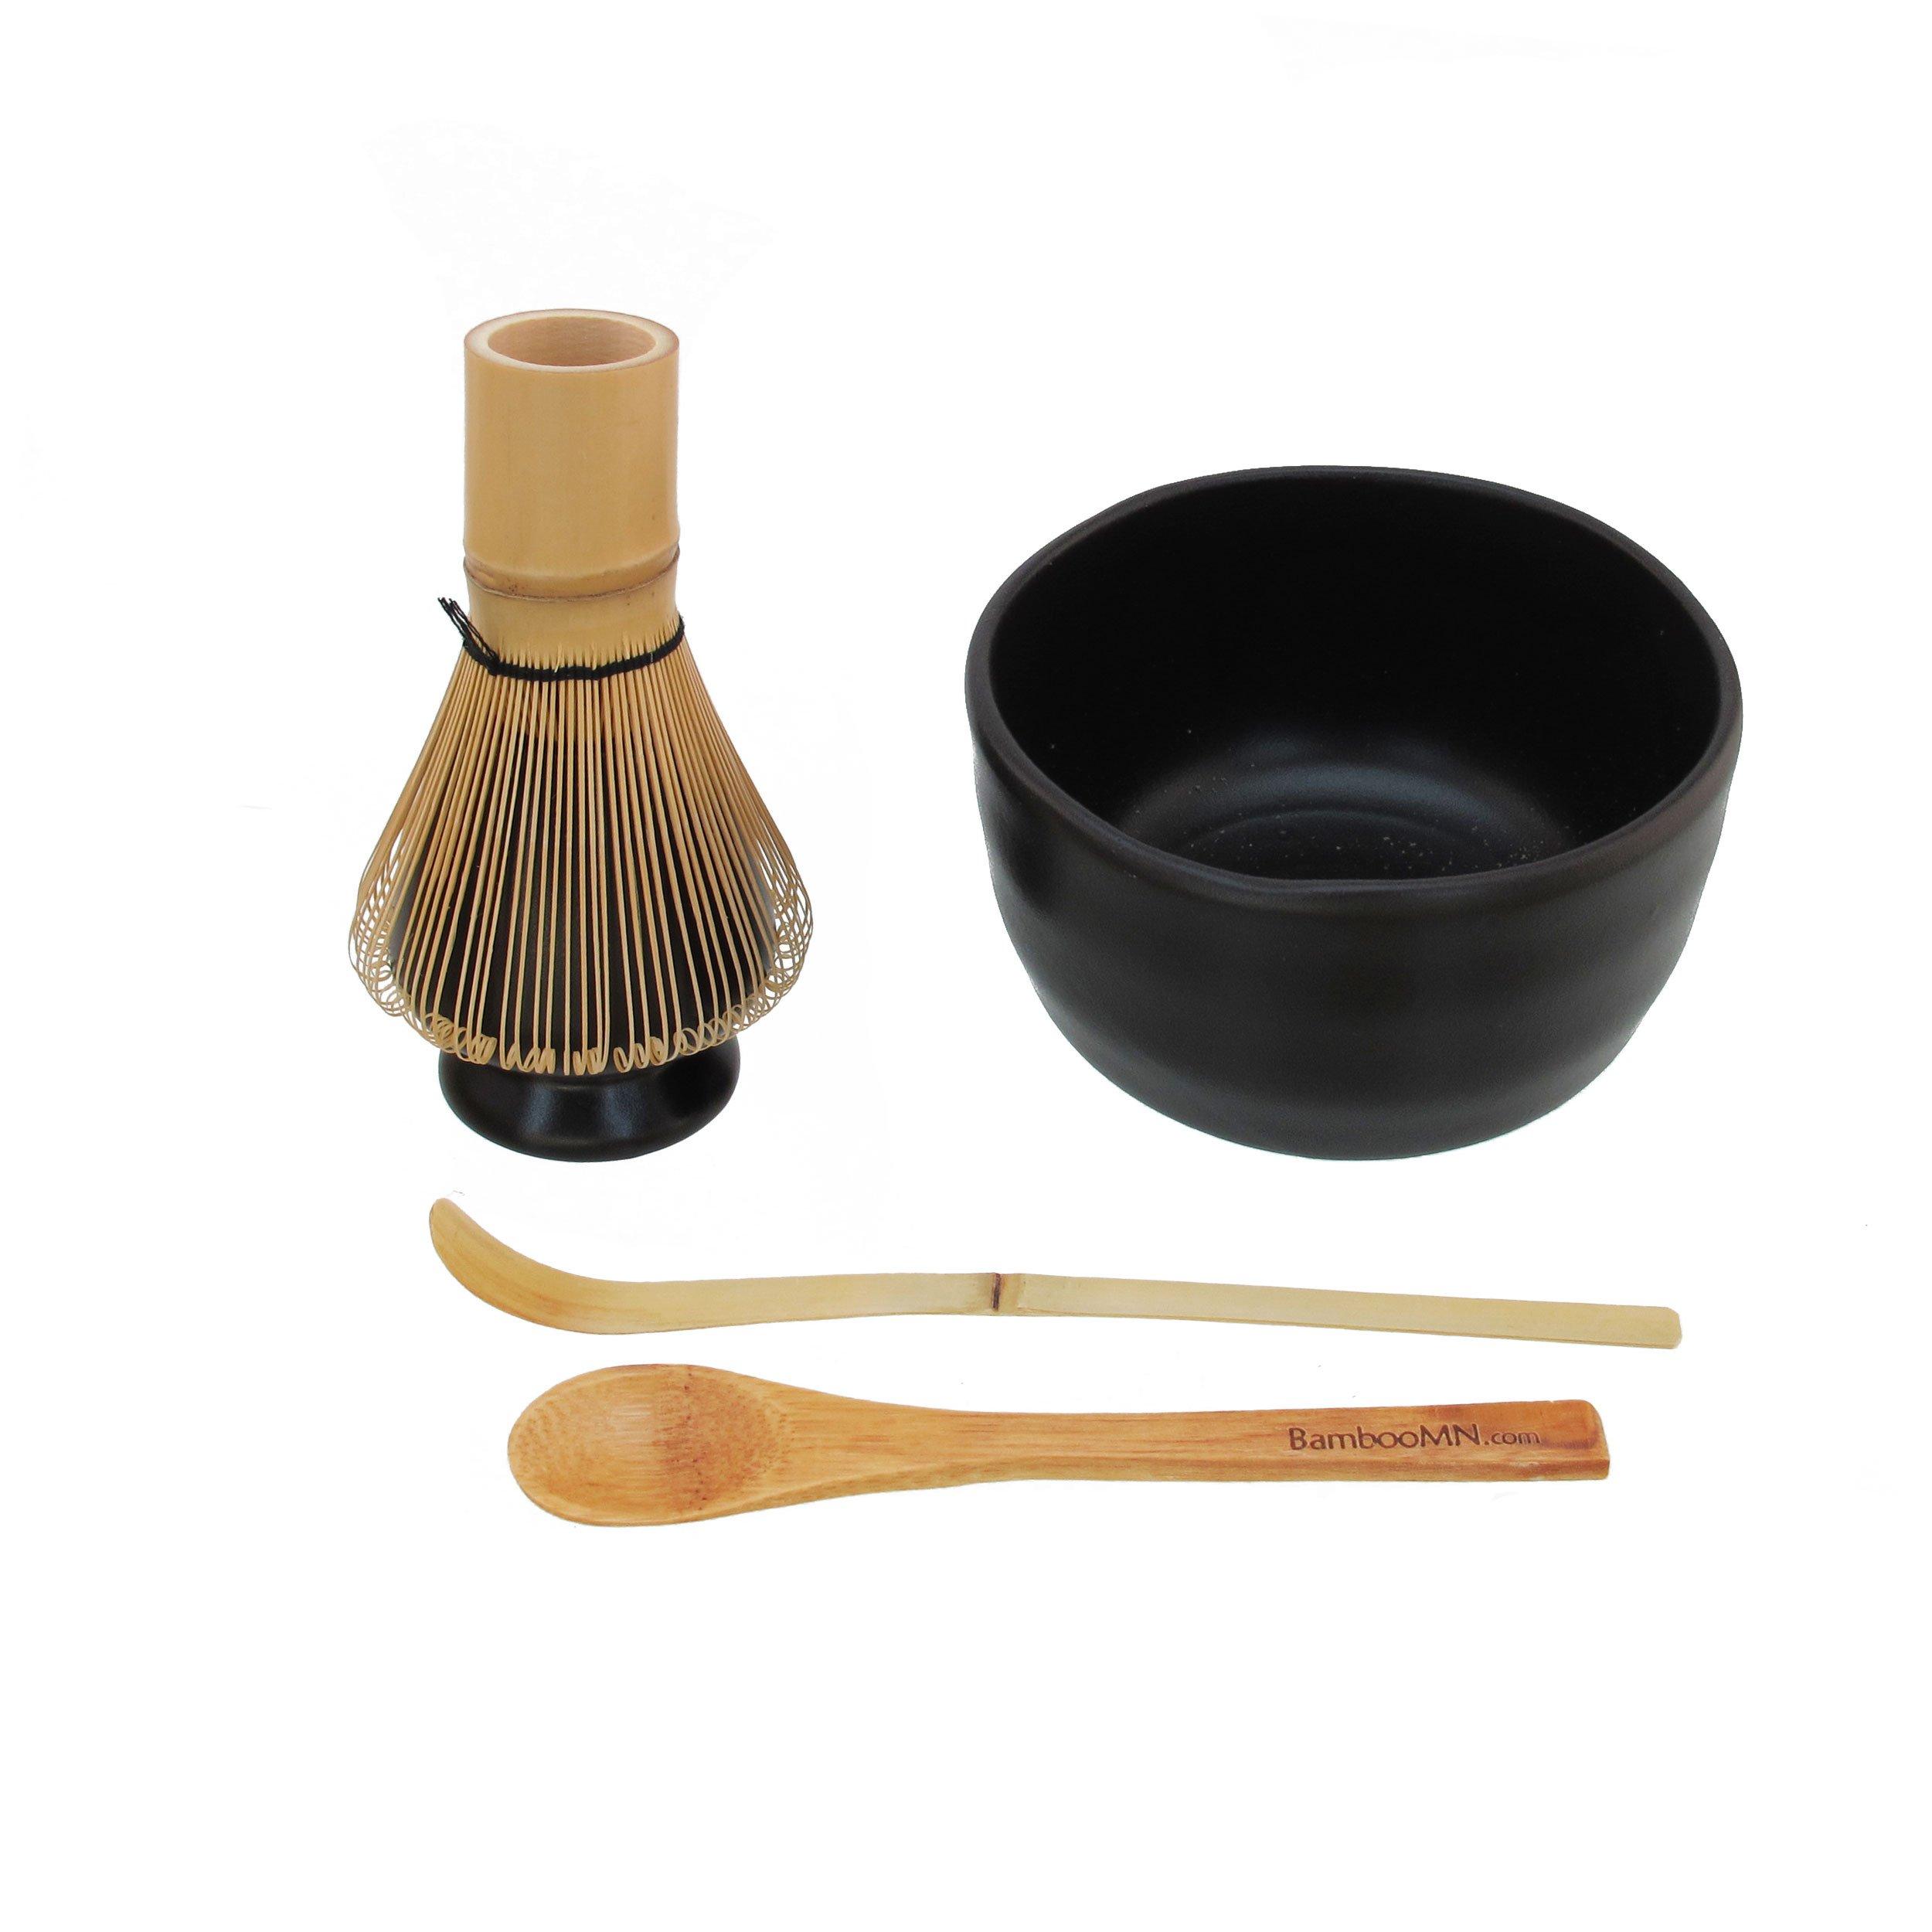 BambooMN Brand - Matcha Bowl Set (Includes Bowl, Rest,Tea Whisk, Chasaku, Tea Spoon) 1 Set Black by BambooMN